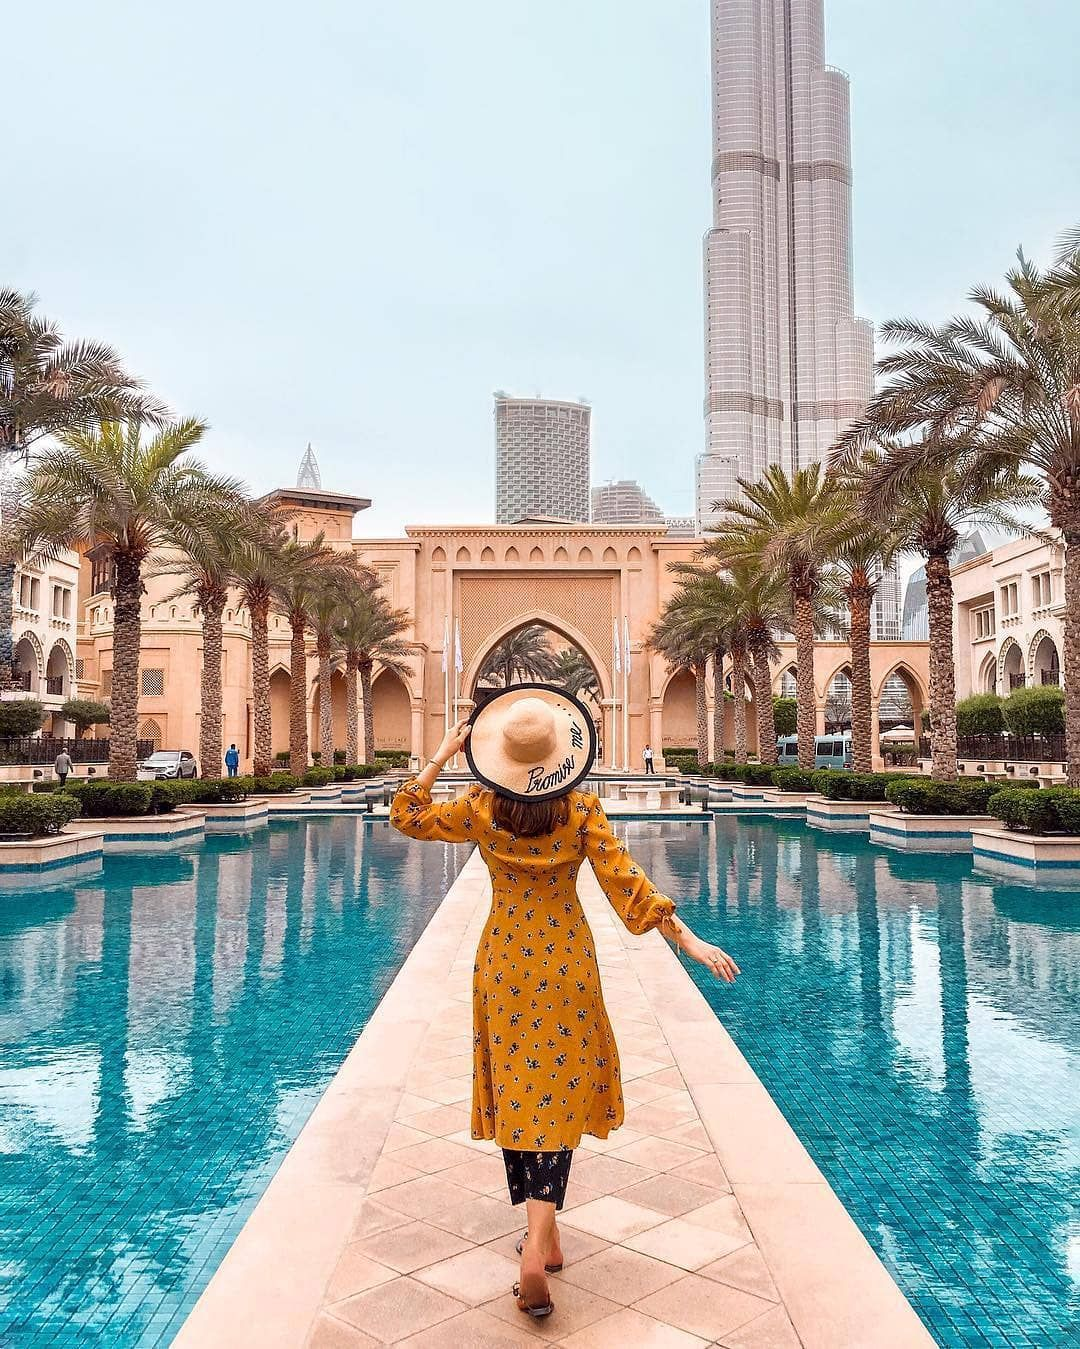 Wandering Around Big City Of Dubai Palace Downtown By Itsme Tatjana Follow Tag Theluxuryasia Theluxuryasia And Share Your City Asia Palace Hotel